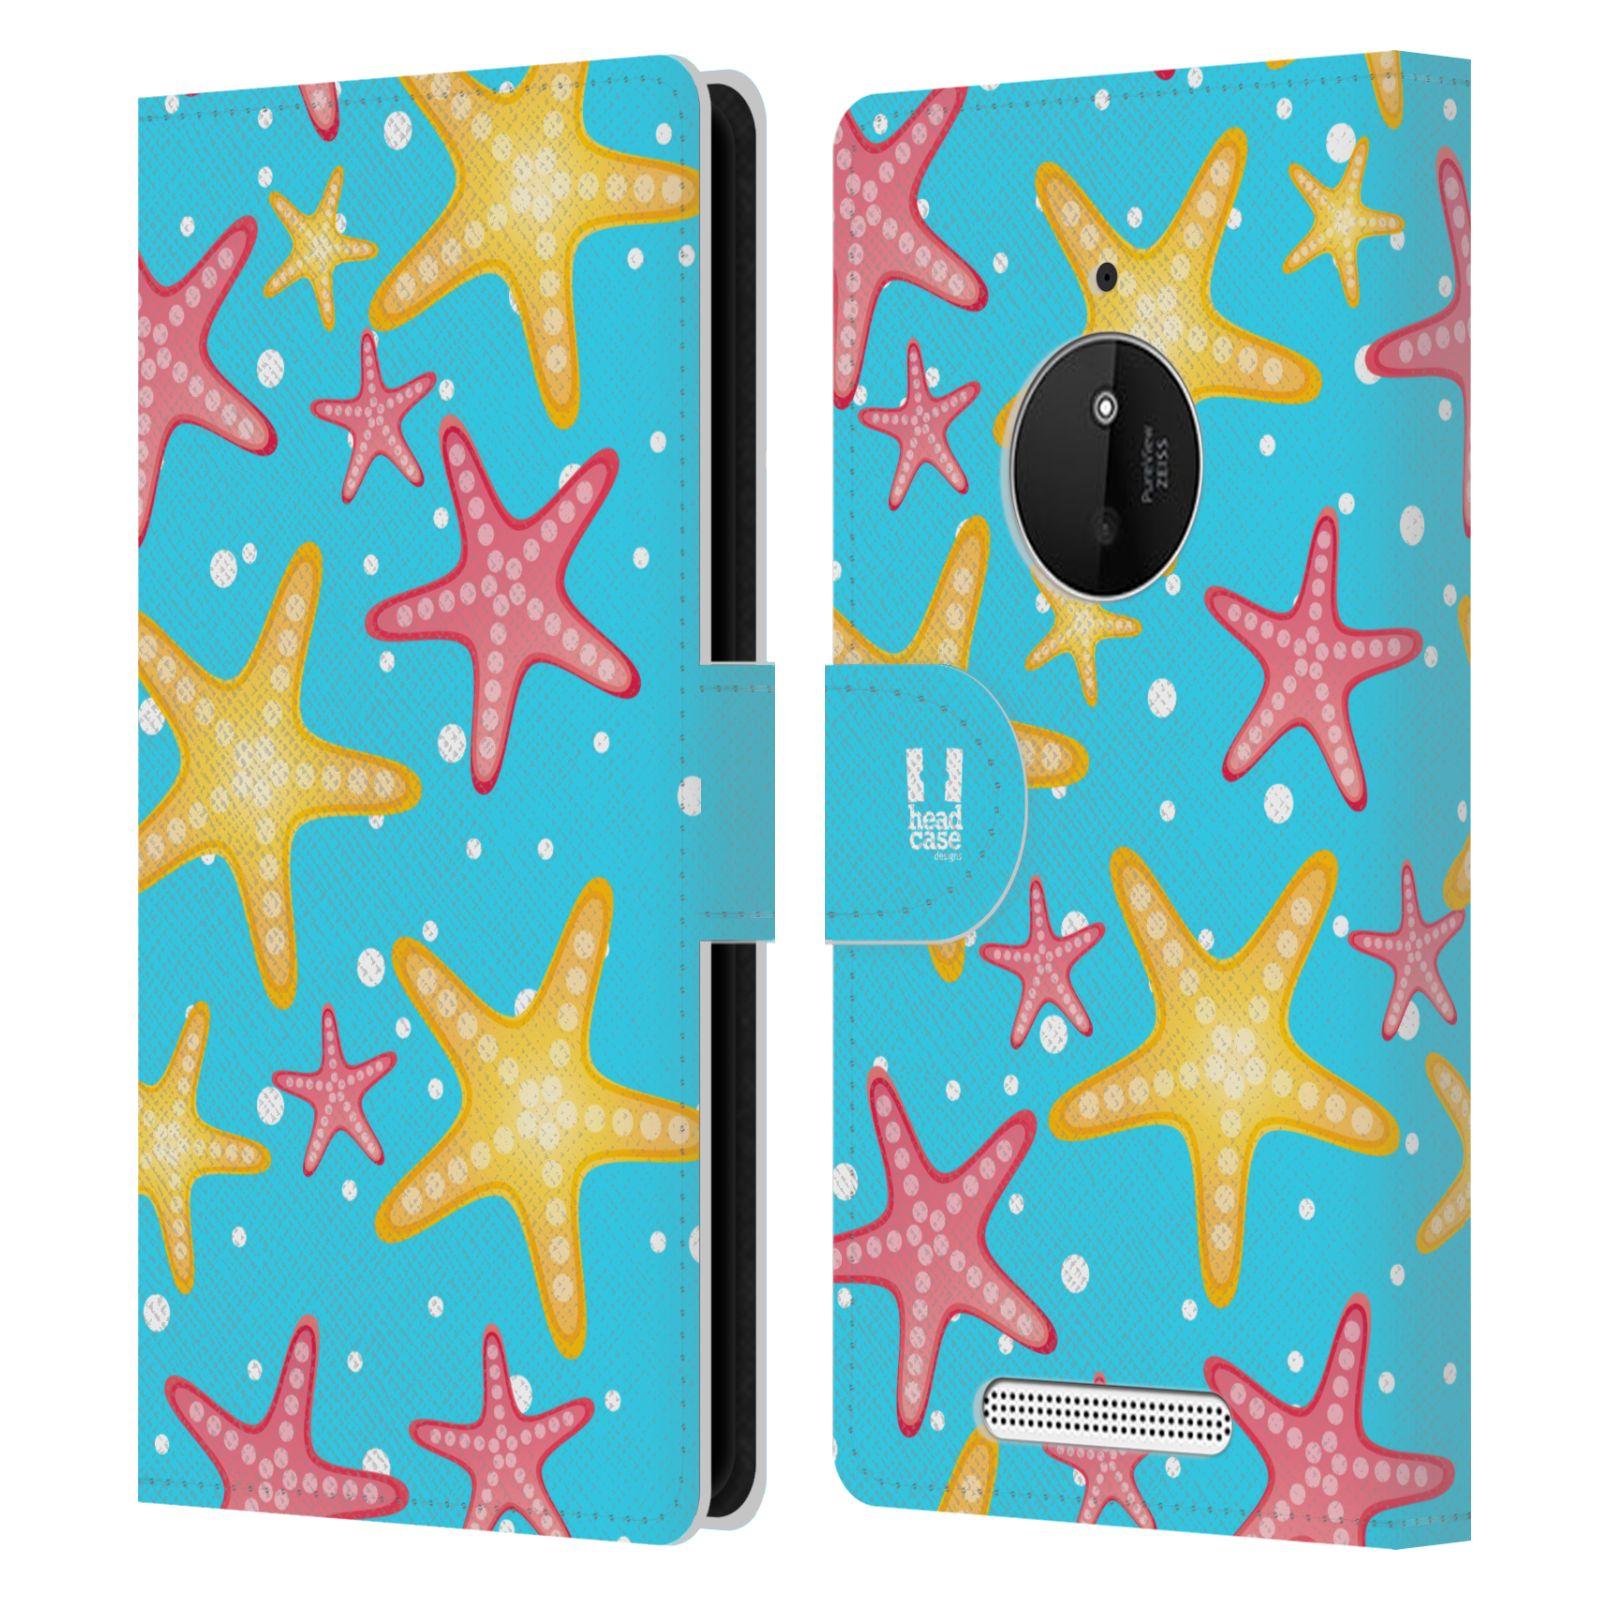 HEAD CASE Flipové pouzdro pro mobil NOKIA LUMIA 830 Mořský živočich hvězdice modrá barva pozadí